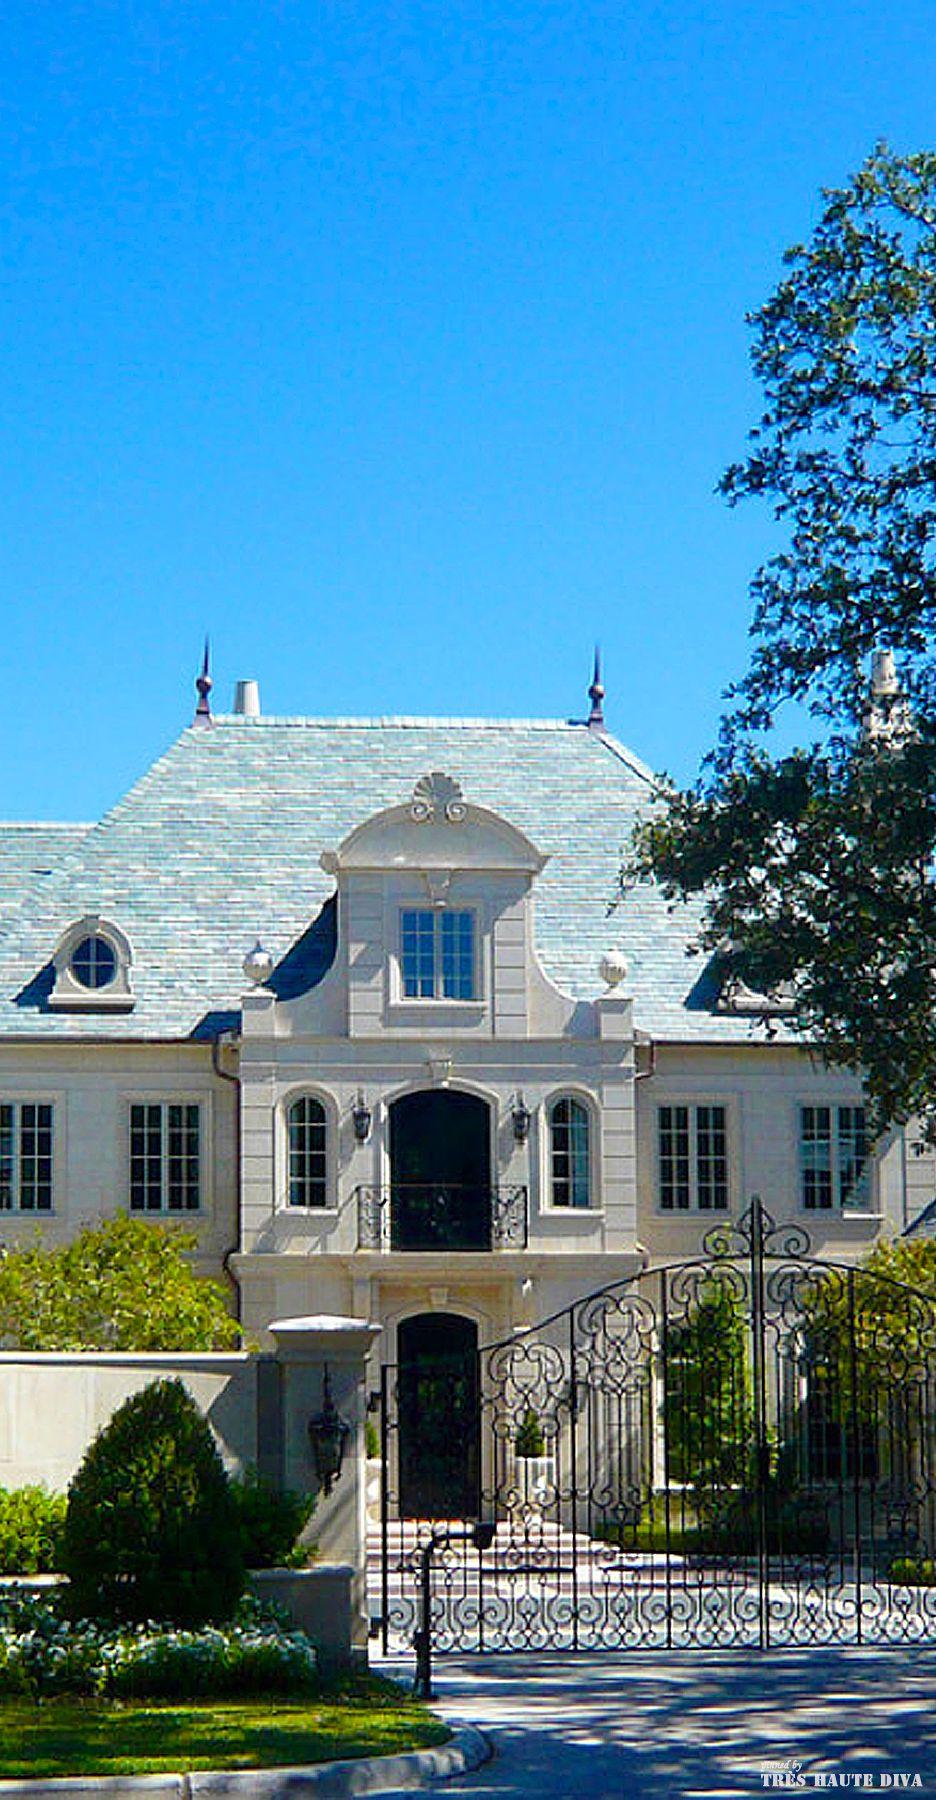 classic french chateau style exterior chateaux de millionairess pinterest french chateau. Black Bedroom Furniture Sets. Home Design Ideas